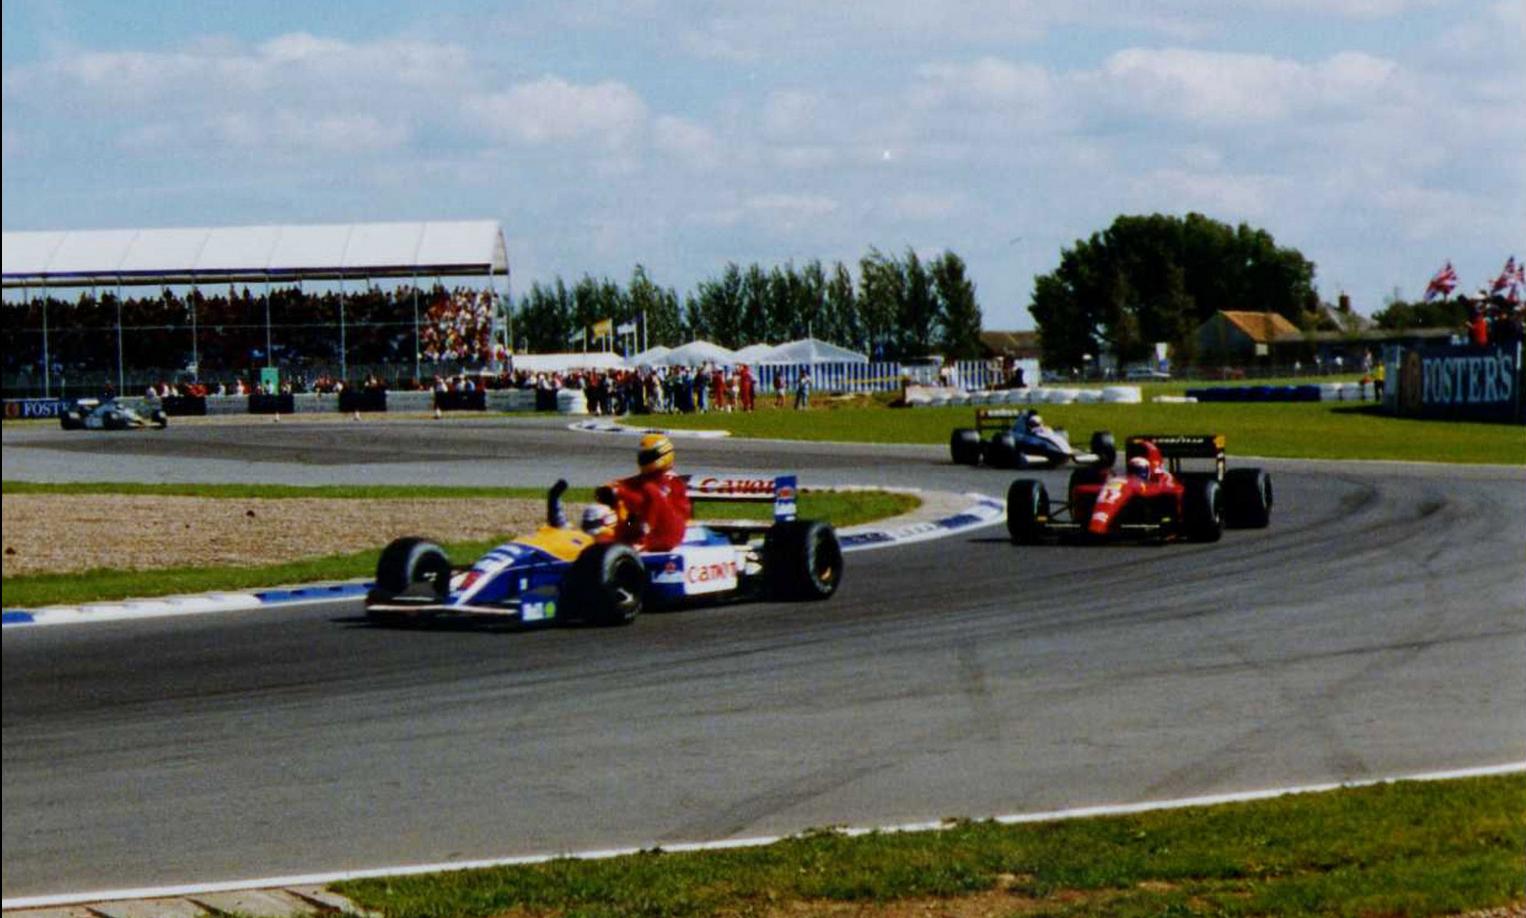 Silverstone_Race_Circuit_UK